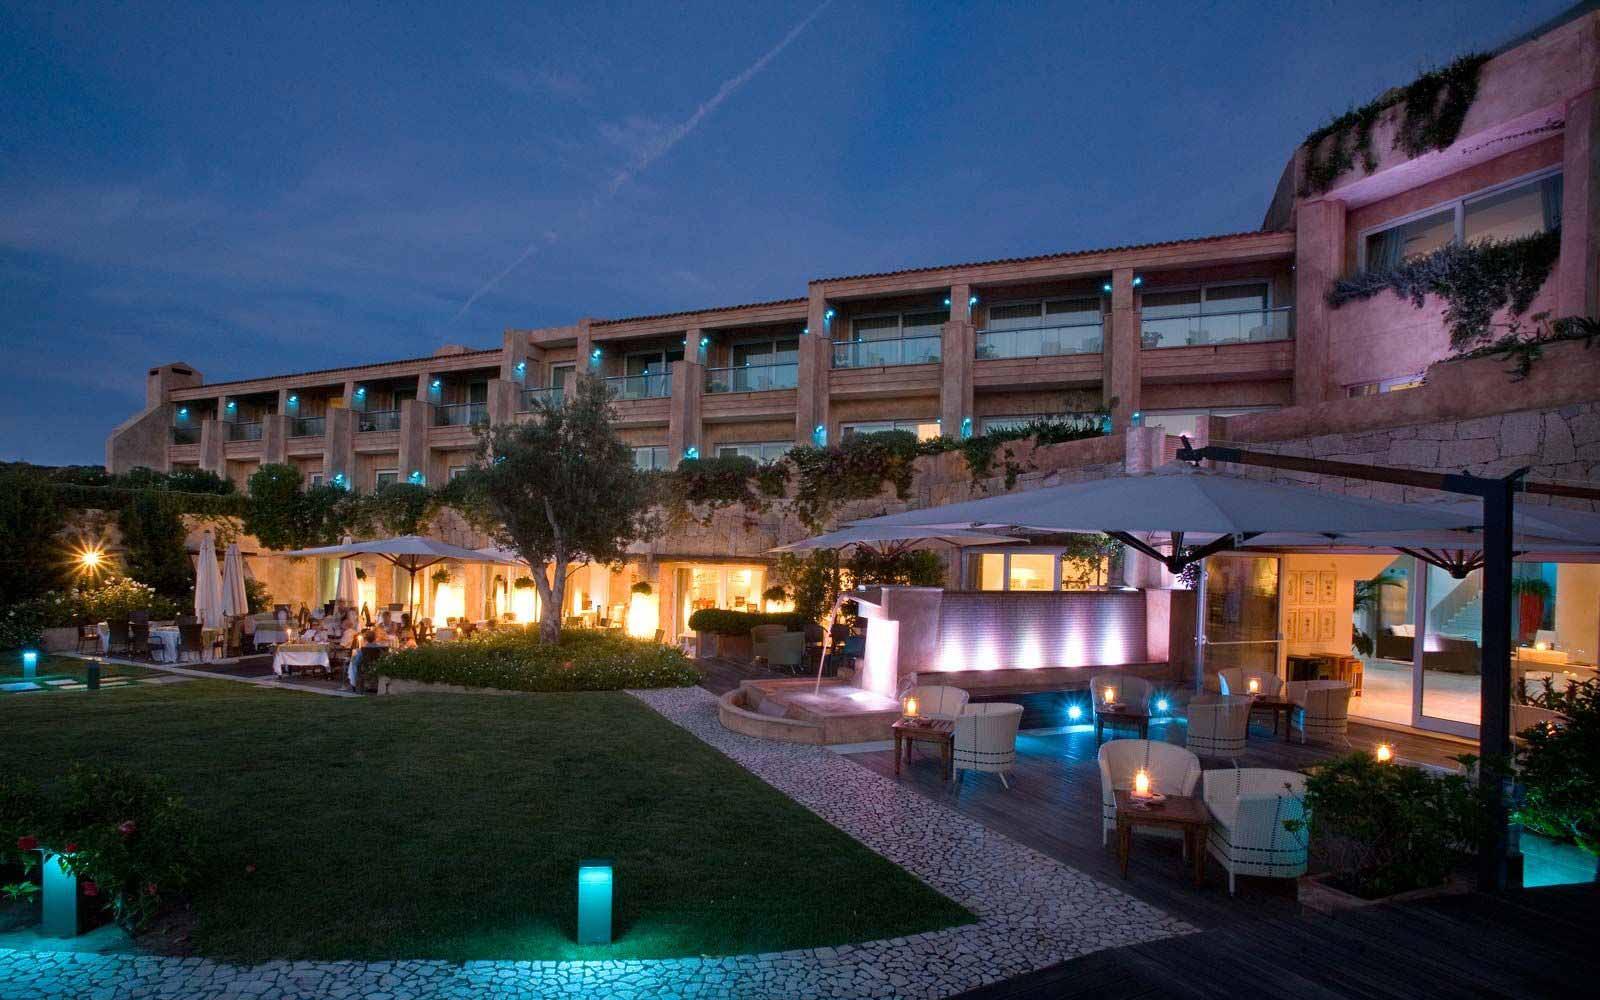 L'Ea Bianca Luxury Resort by night